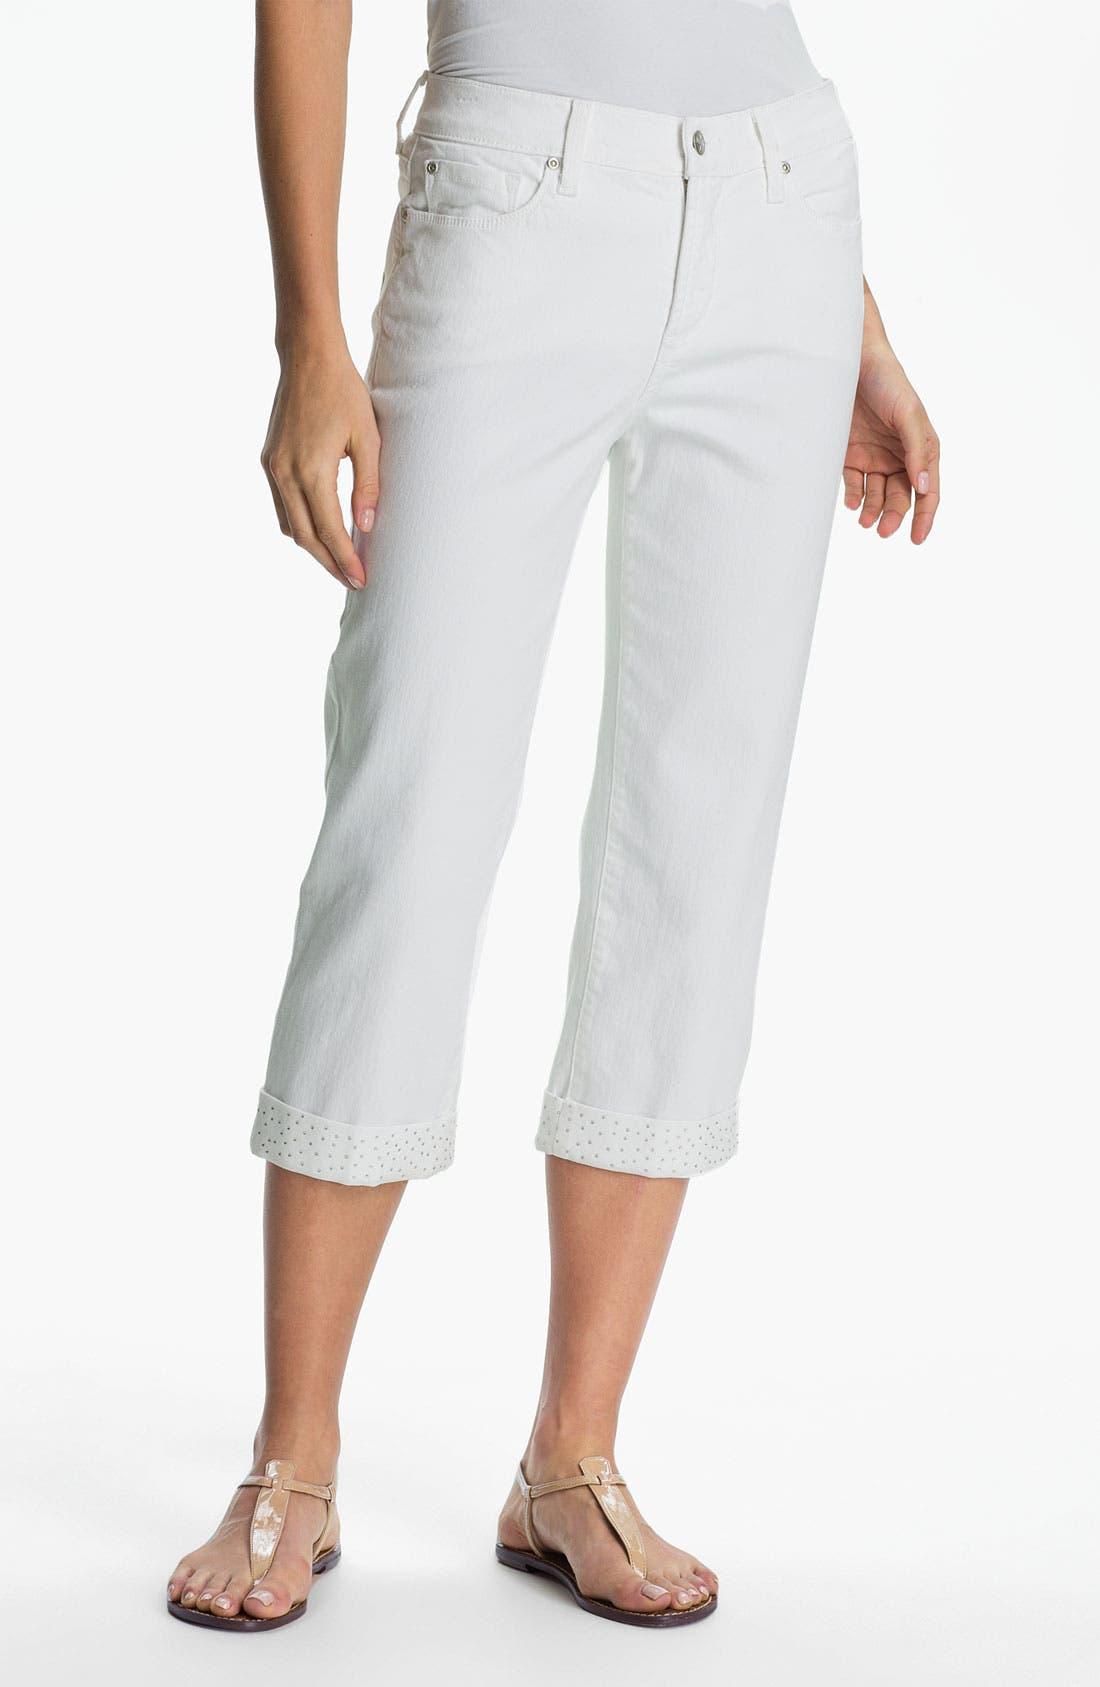 Main Image - NYDJ 'Alyssia' Embellished Crop Jeans